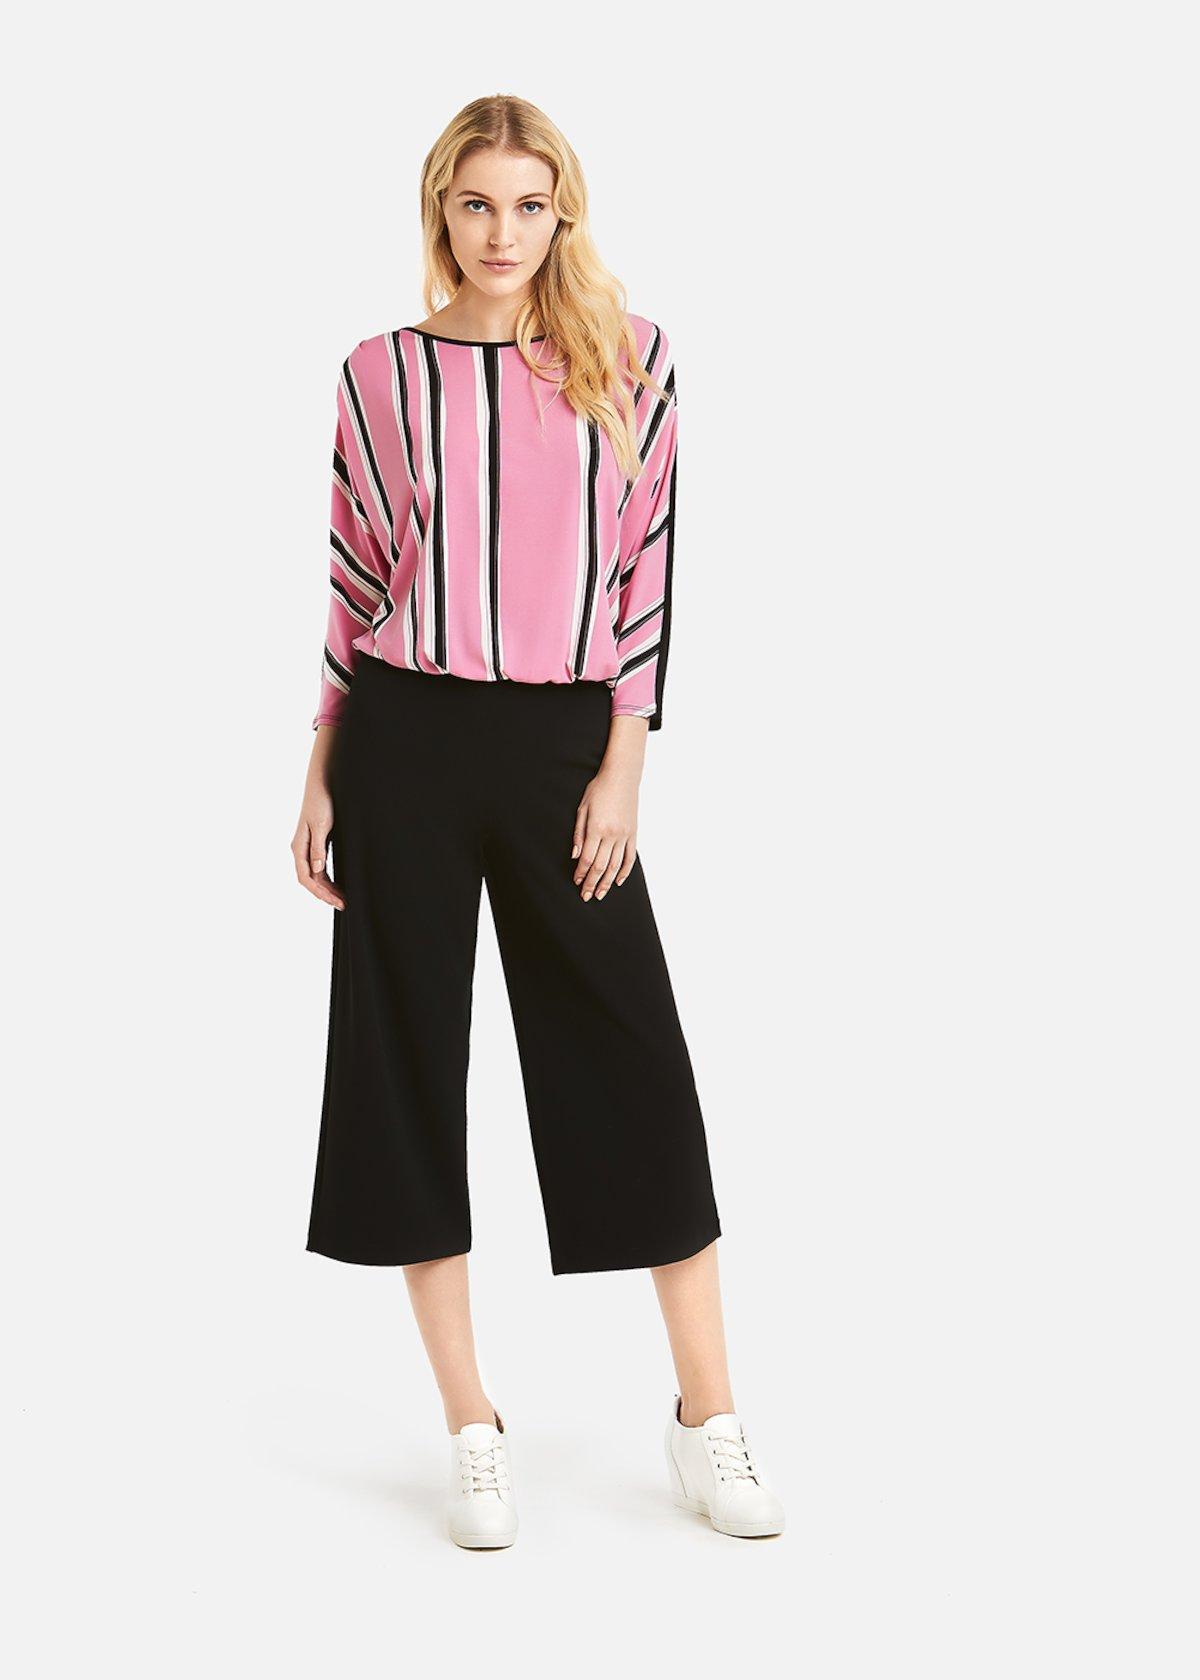 Plinio 4 short palazzo trousers - Black